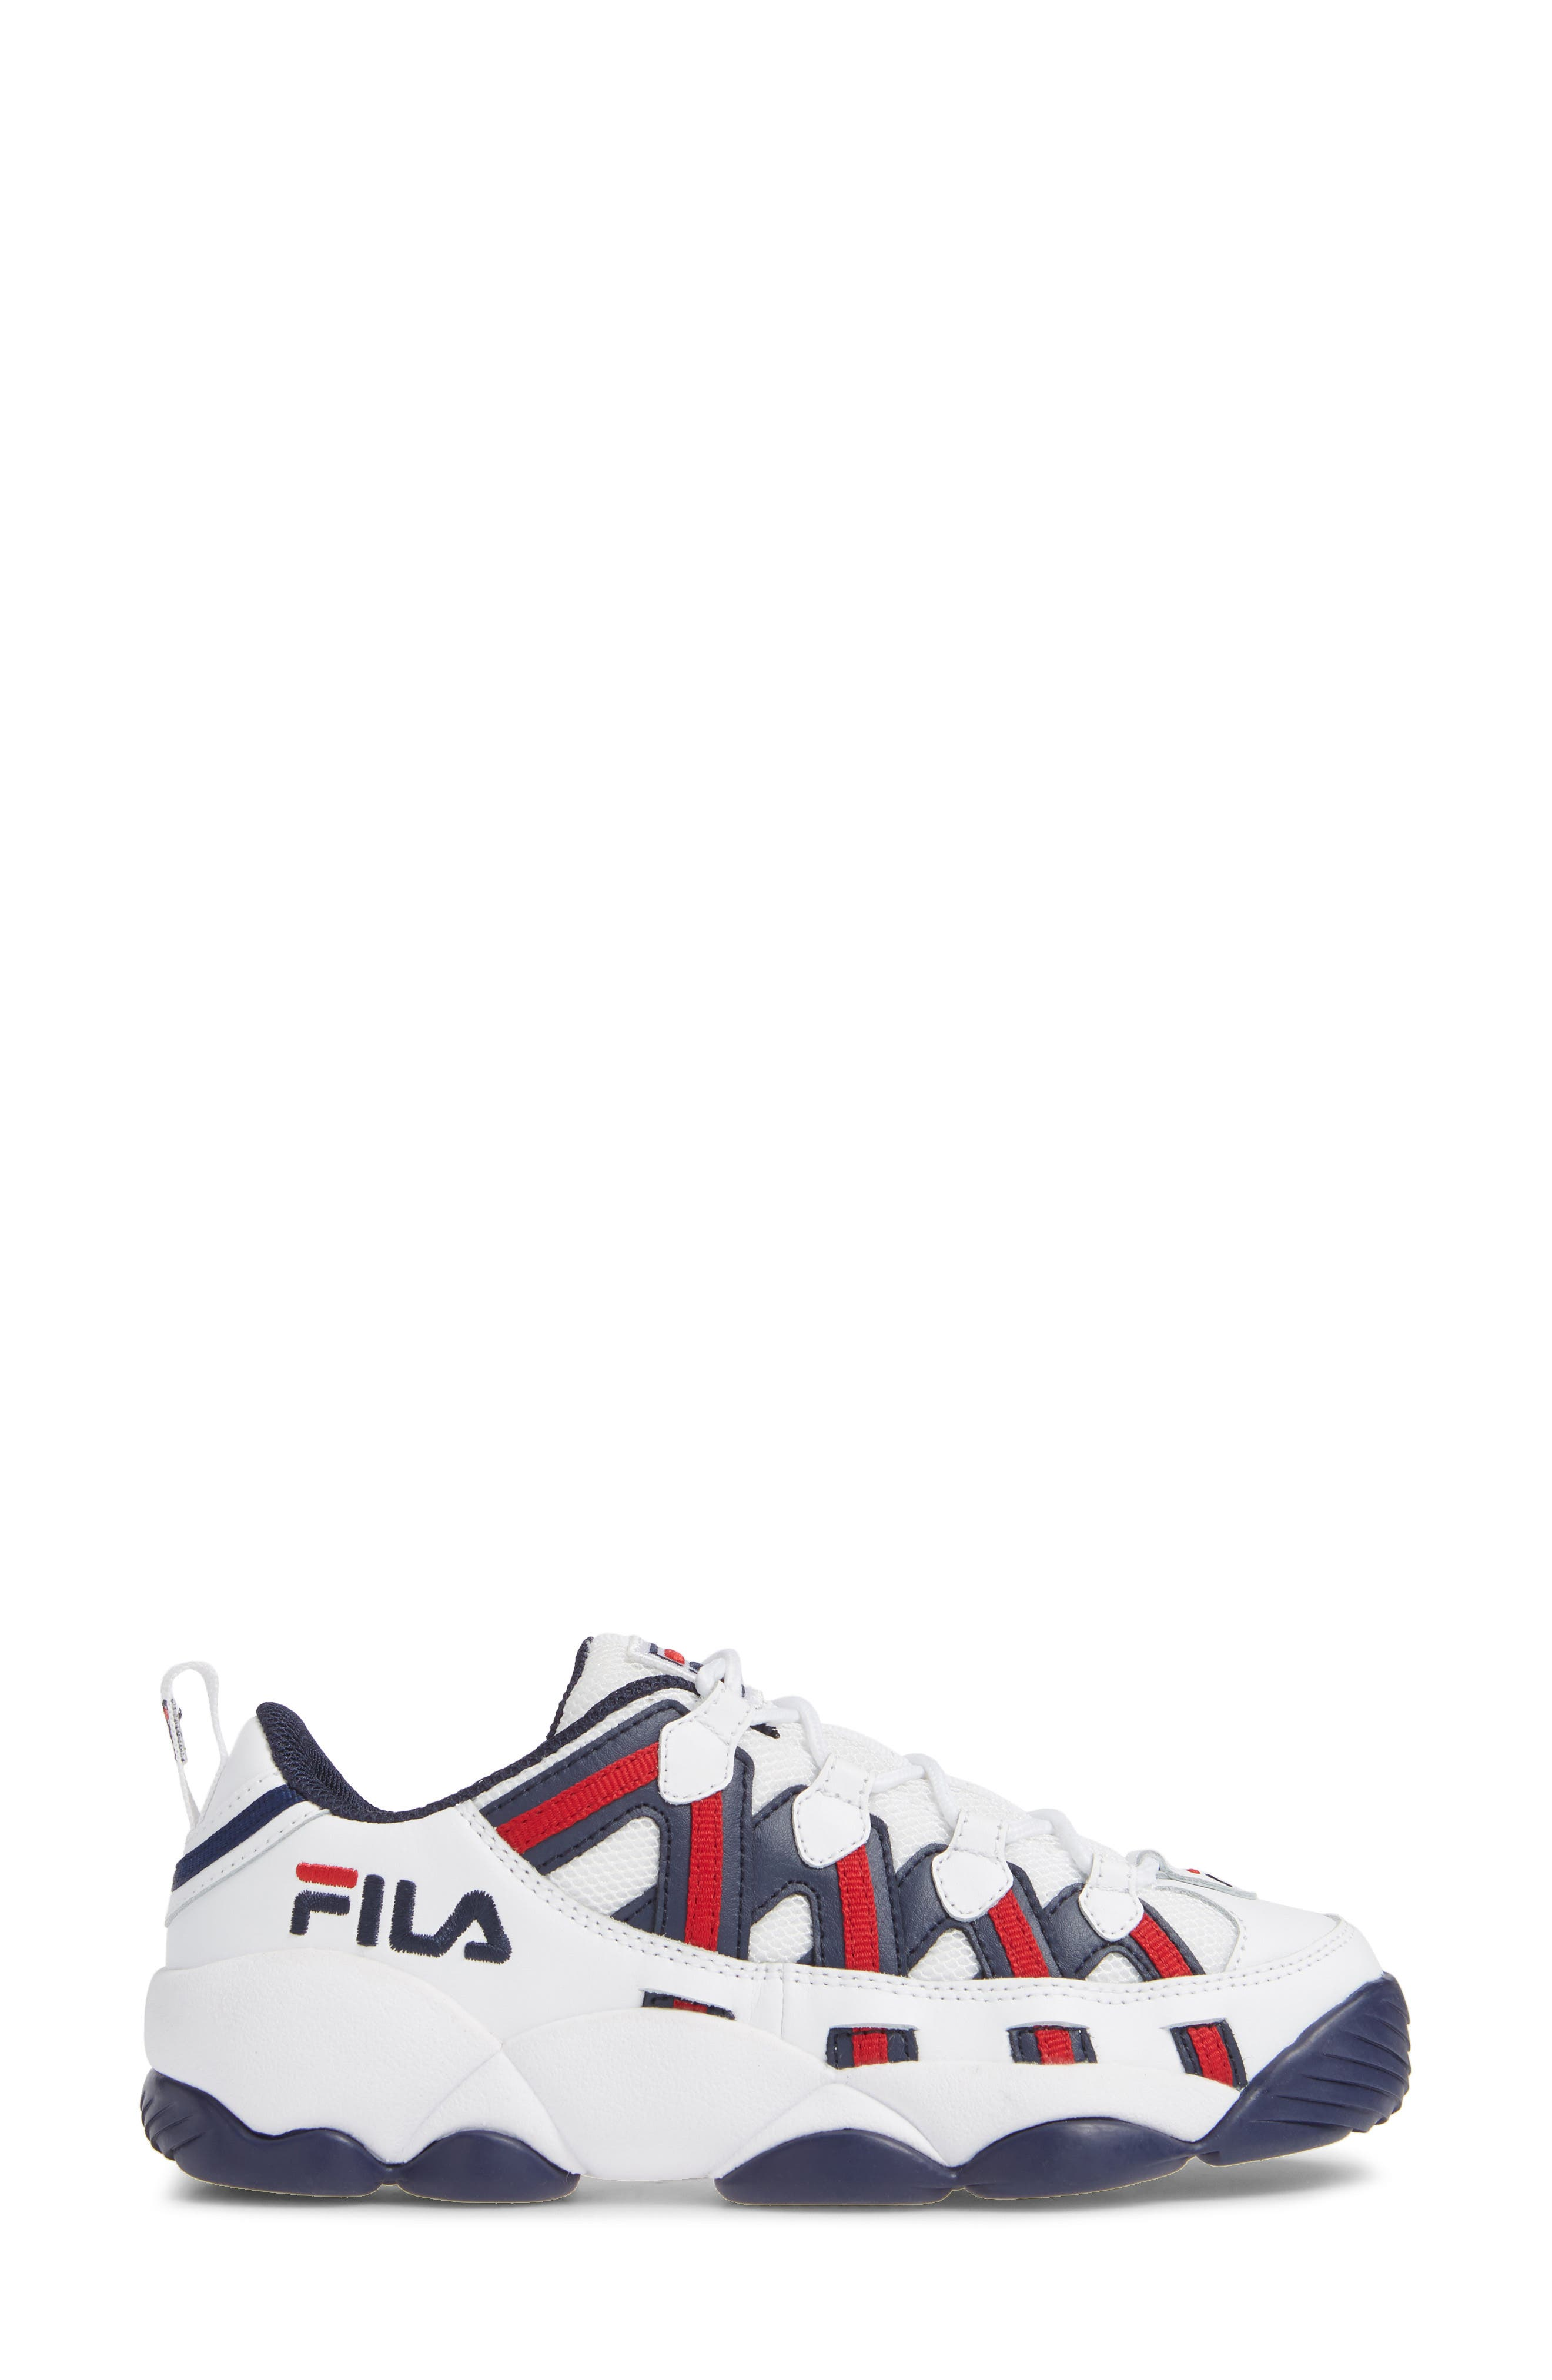 FILA, Spaghetti Low Sneaker, Alternate thumbnail 3, color, WHITE/ FILA NAVY/ FILA RED